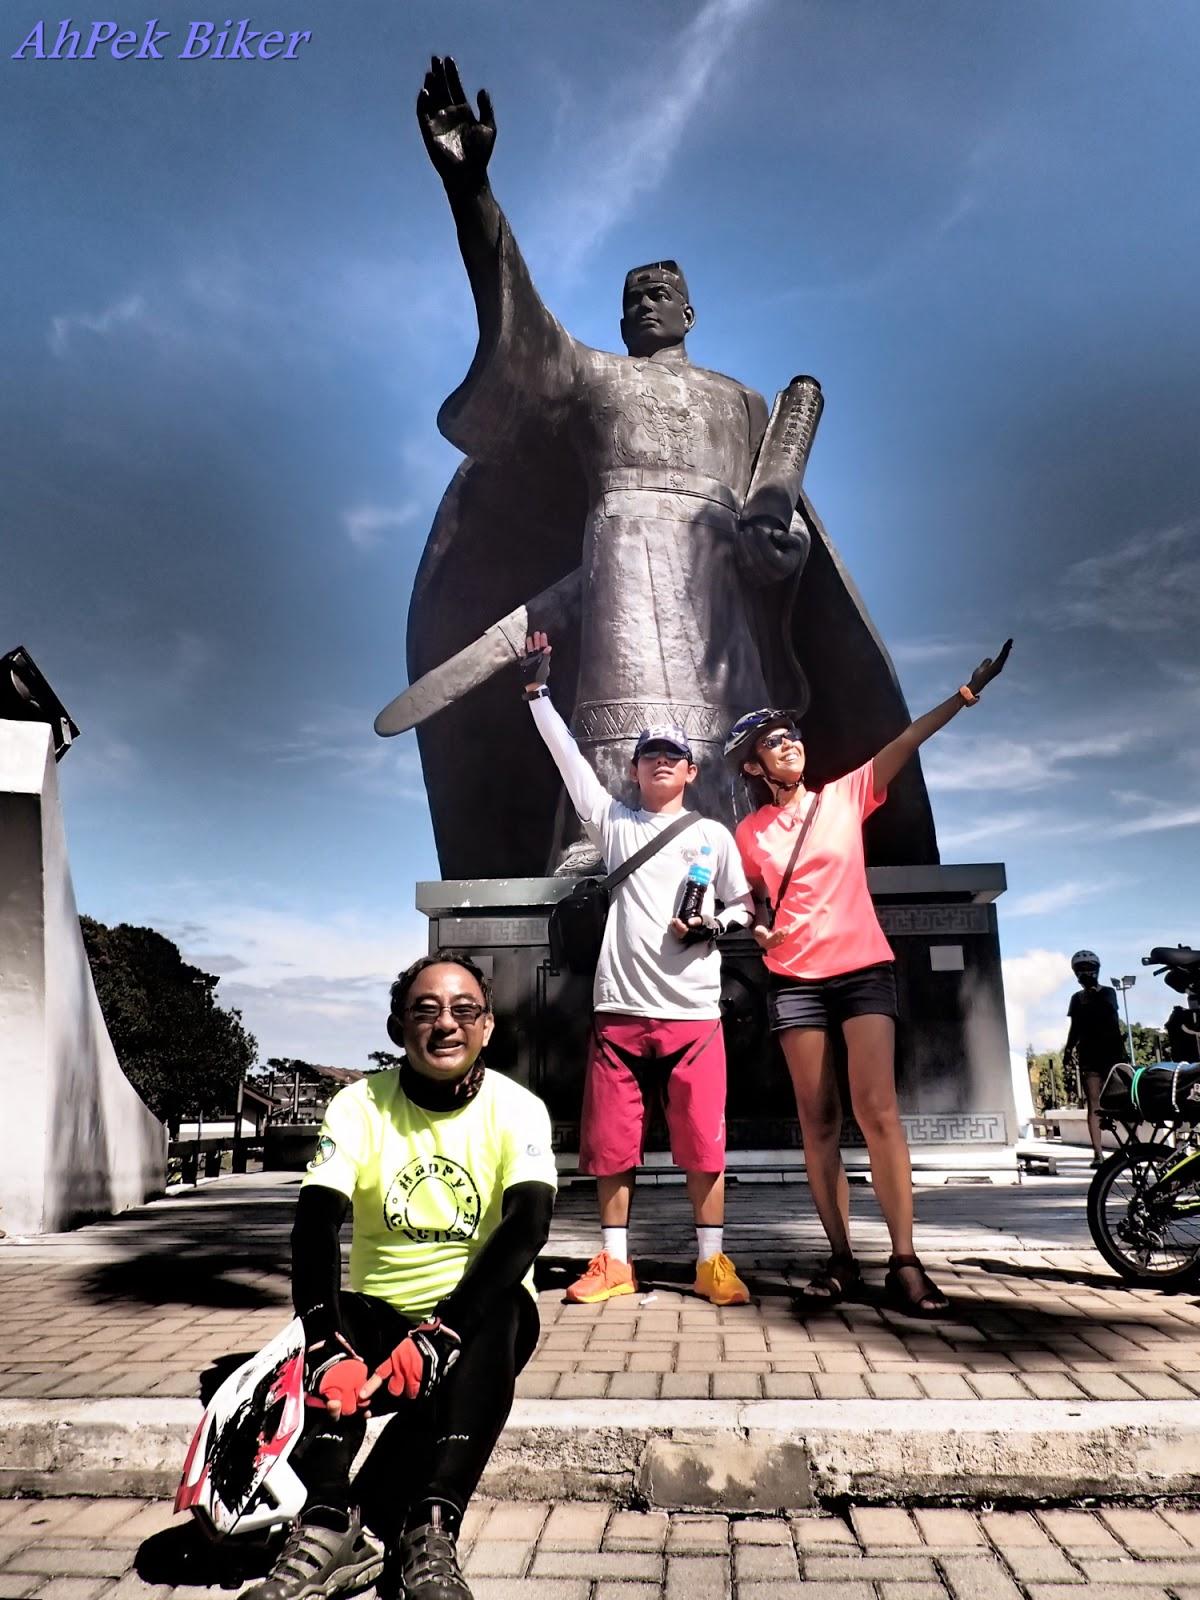 AhPek Biker - Old Dog Rides Again: Cycling Sarawak Gawai